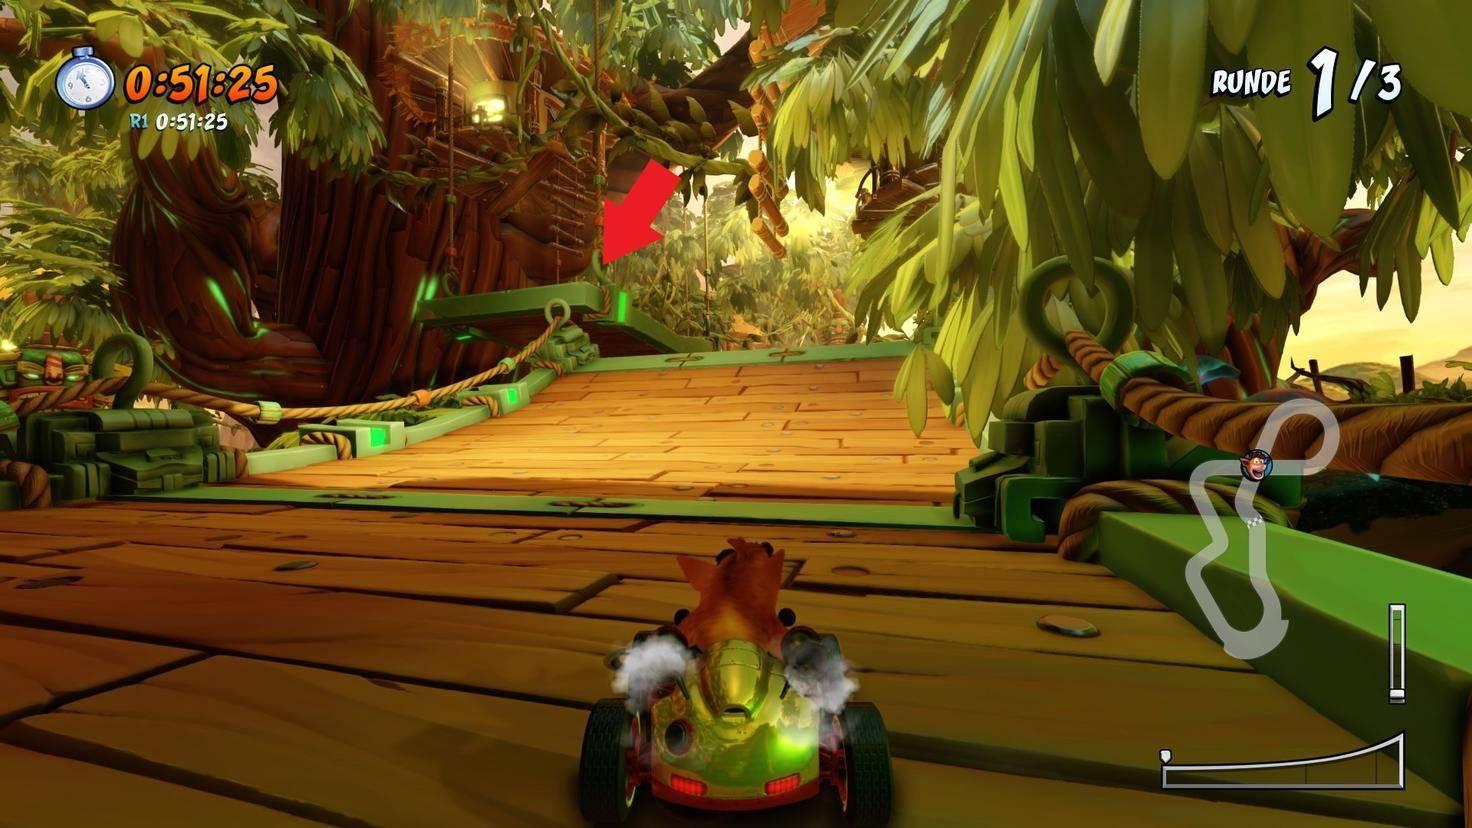 Crash-Team-Racing-Nitro-Fueled-Abkürzung-Dschungel-Boogie-2